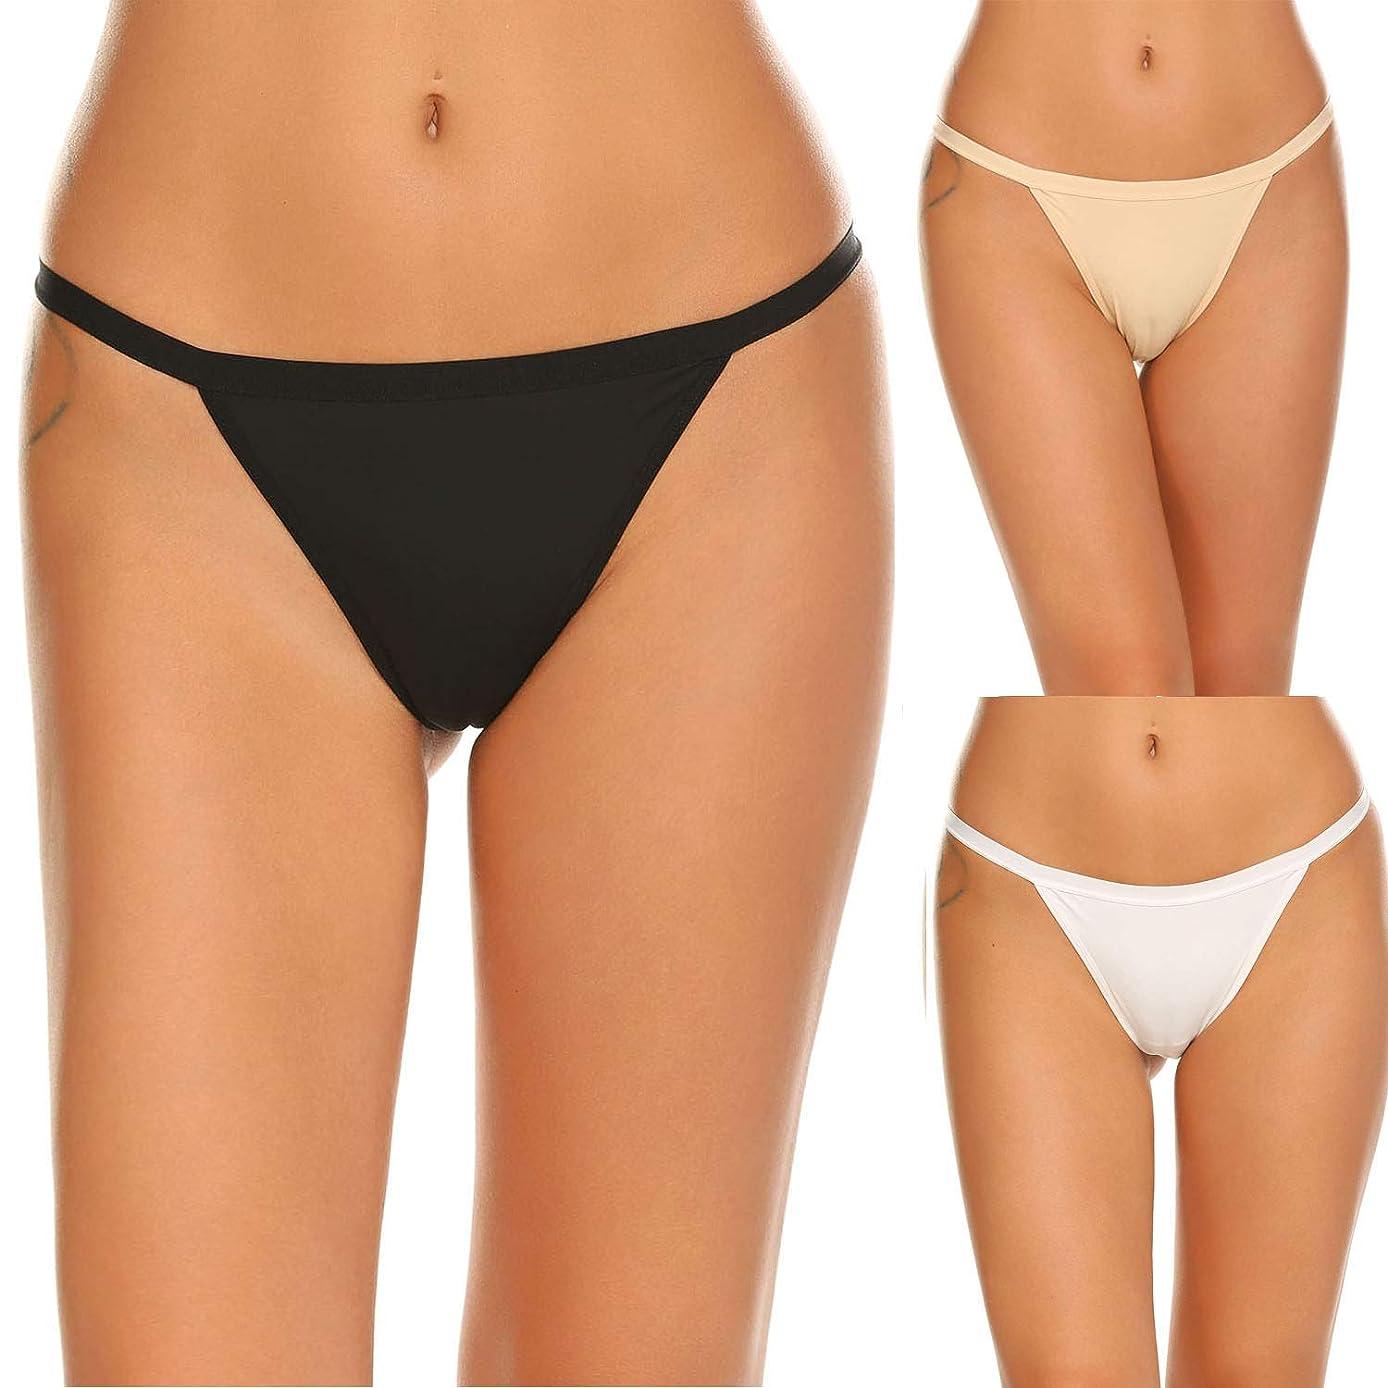 Ekouaer Thong Panties Women's Modern Cotton Underwear 3 Pack - Assorted Colors